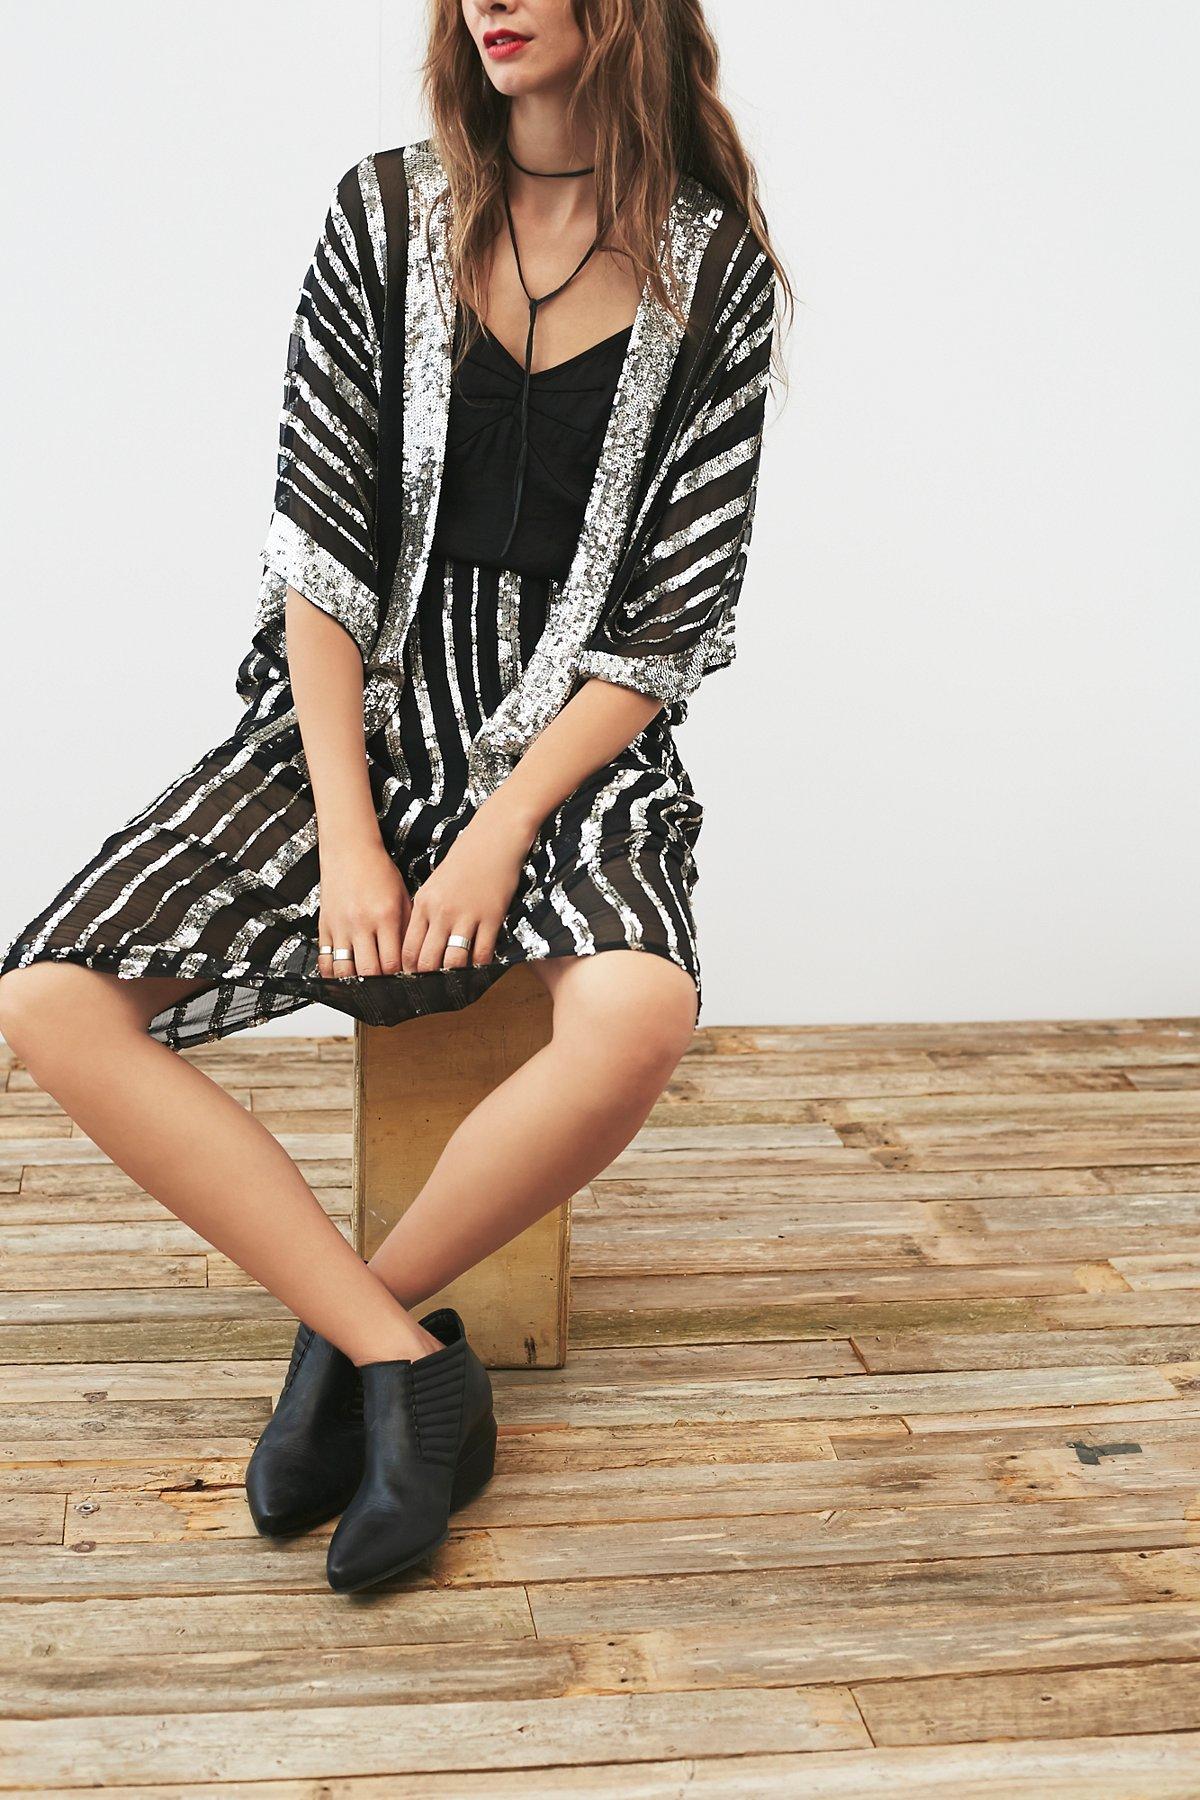 Vintage 1970s Sequin Dress